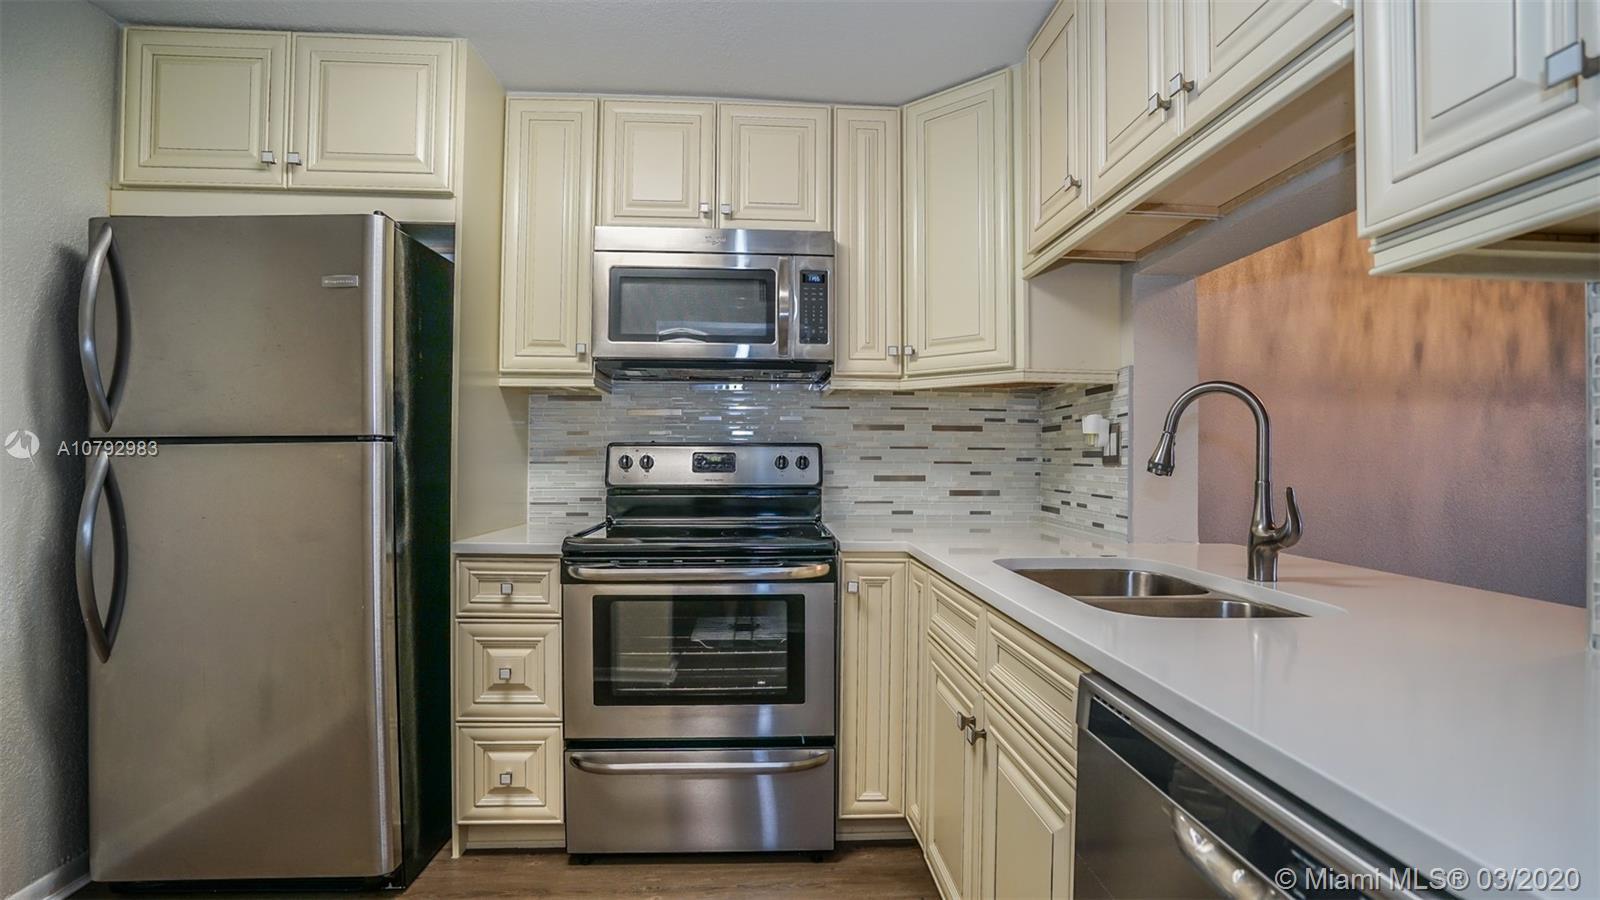 3700 NW 88th Ave #401, Sunrise, FL 33351 - Sunrise, FL real estate listing